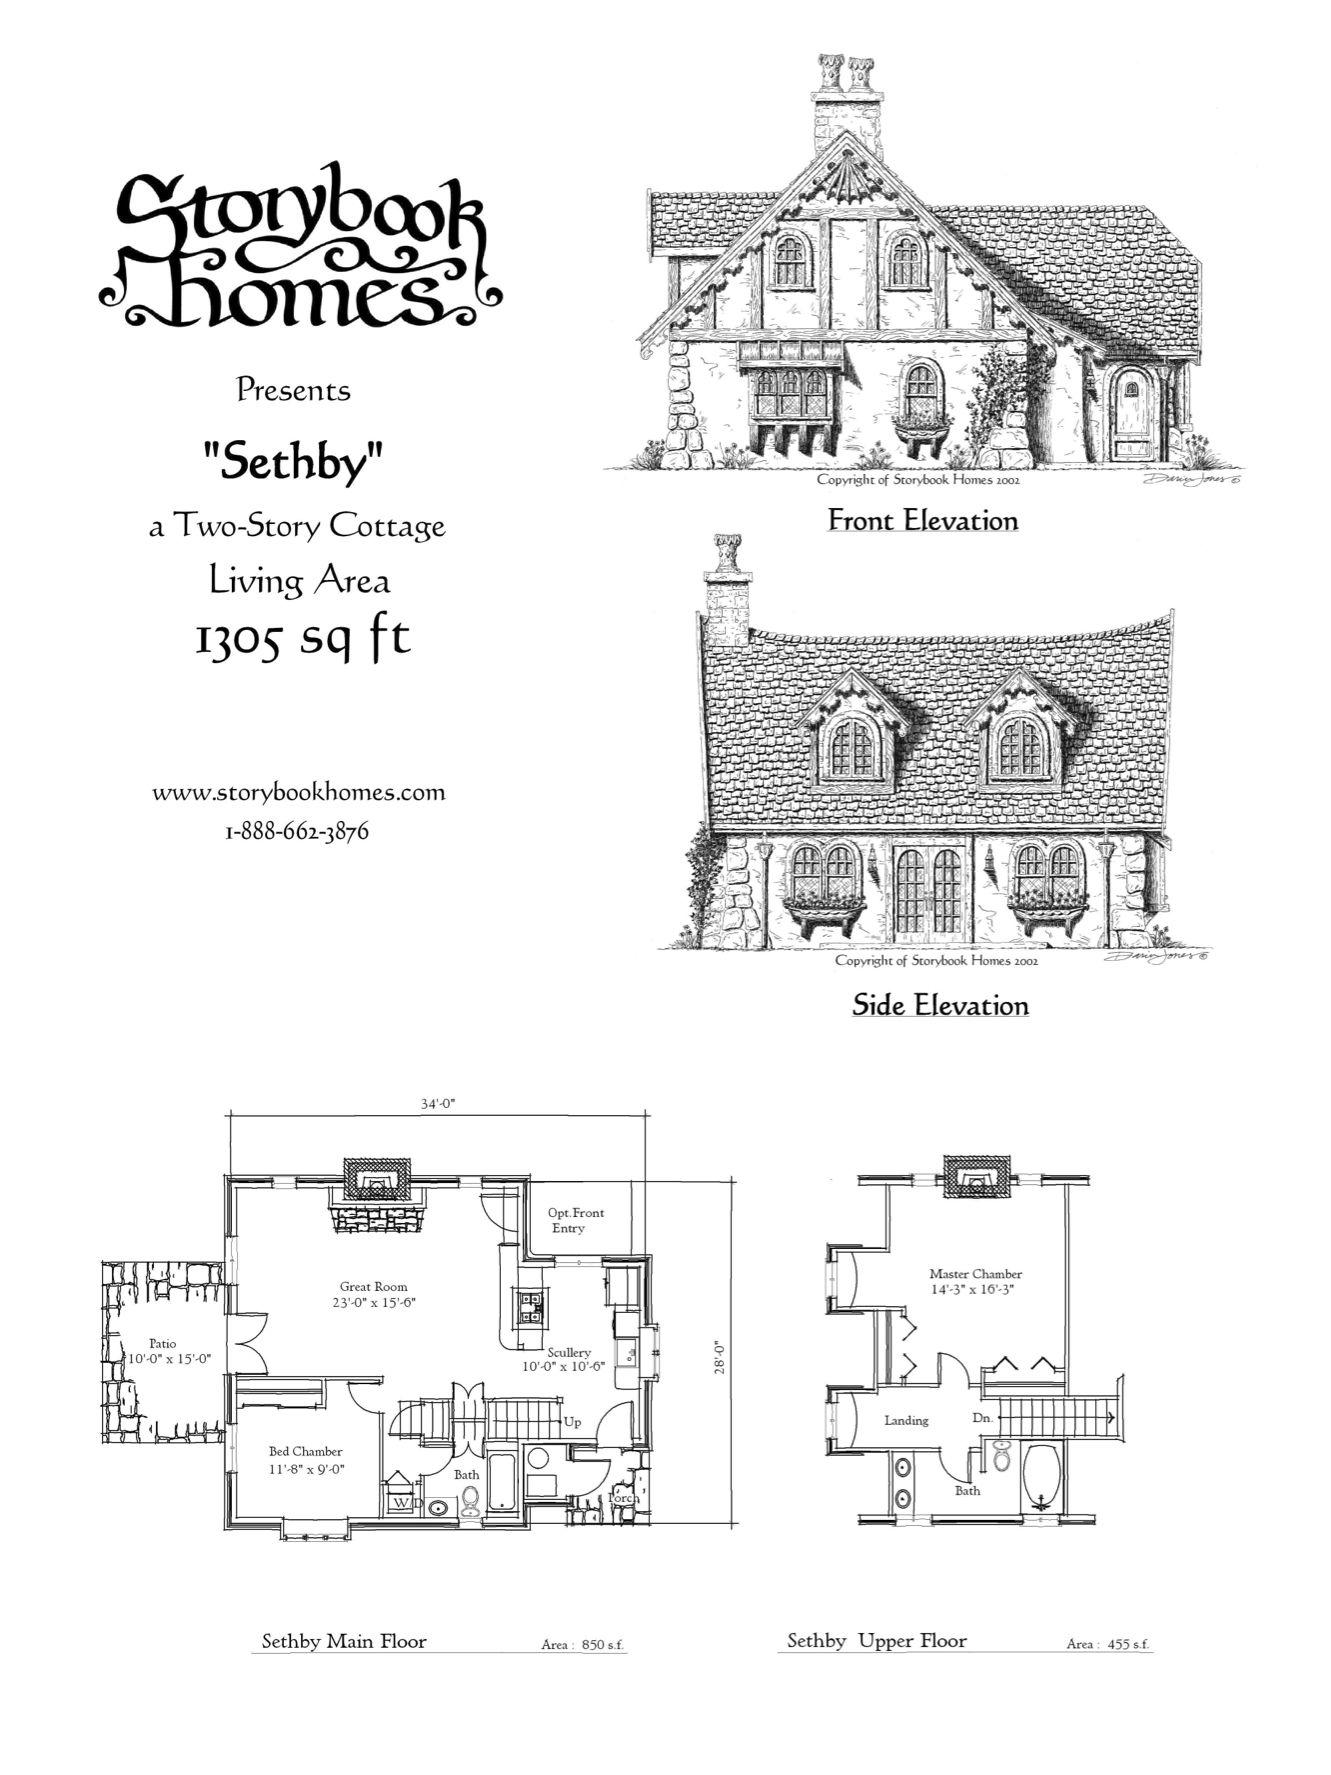 Sethby Houseplan Via Storybook Homes Storybook House Plan